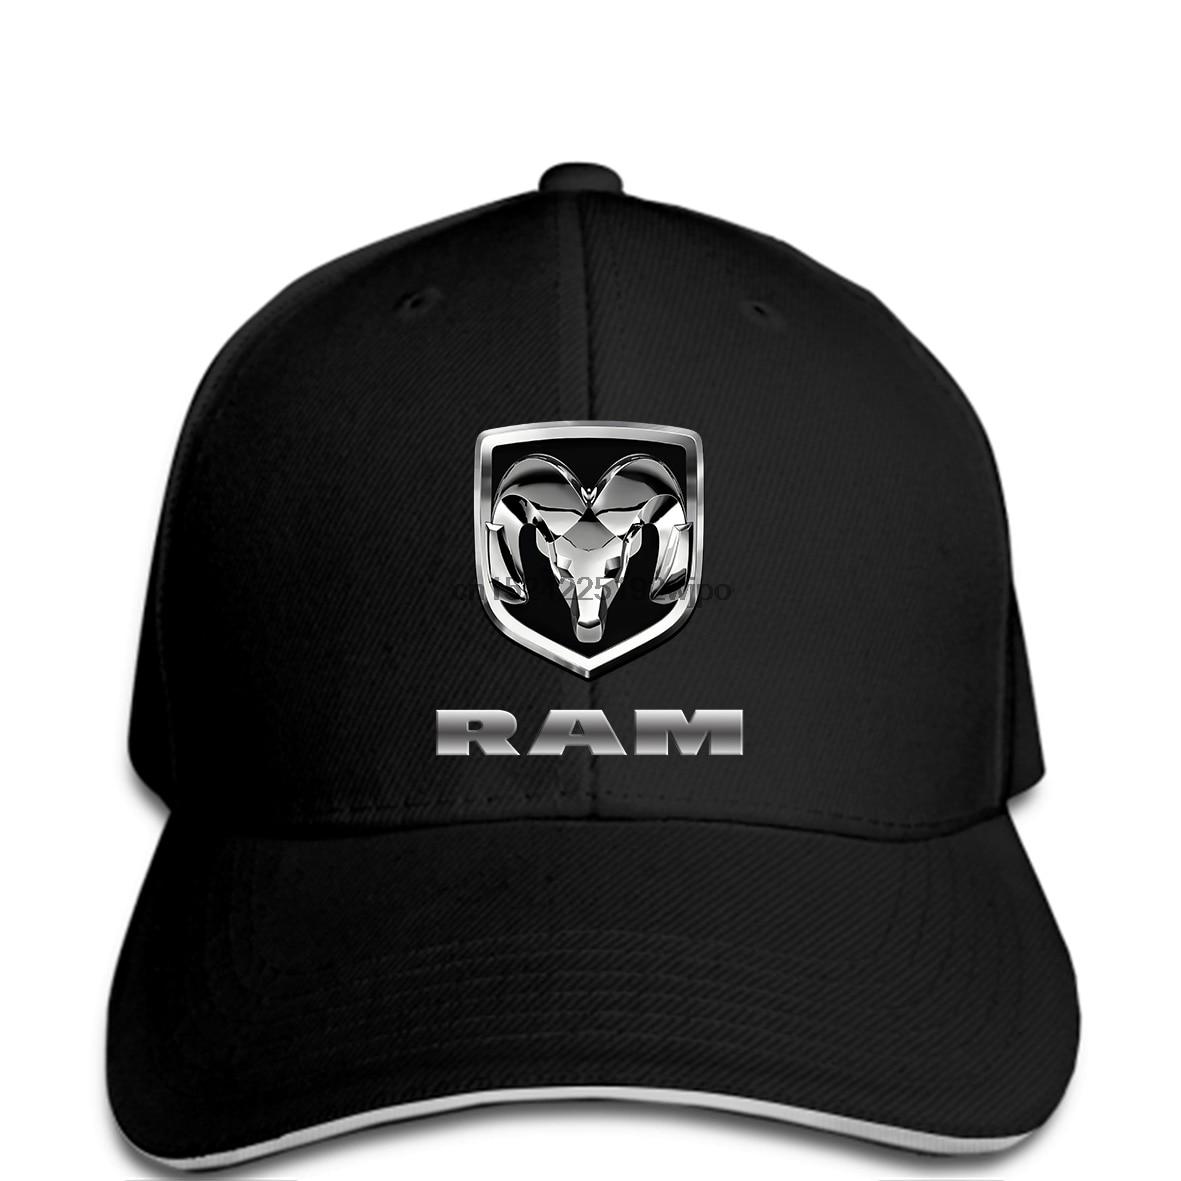 Unisex Baseball Cap with Embroidered Dodge Ram Car Logo